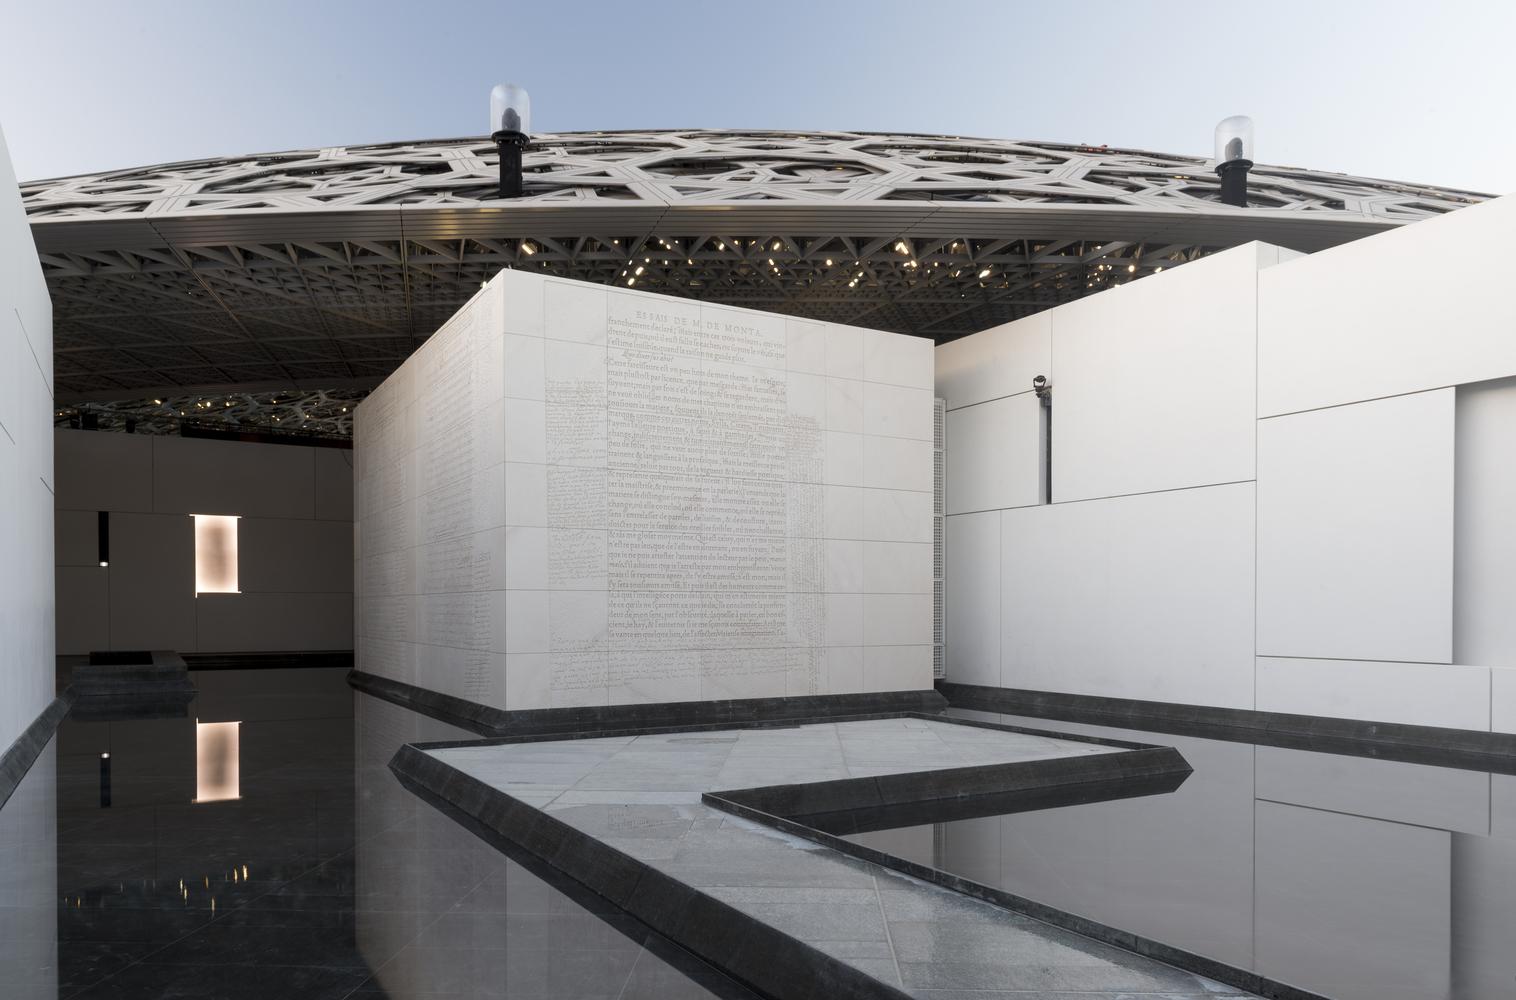 Marc Domage/Louvre Abu Dabi